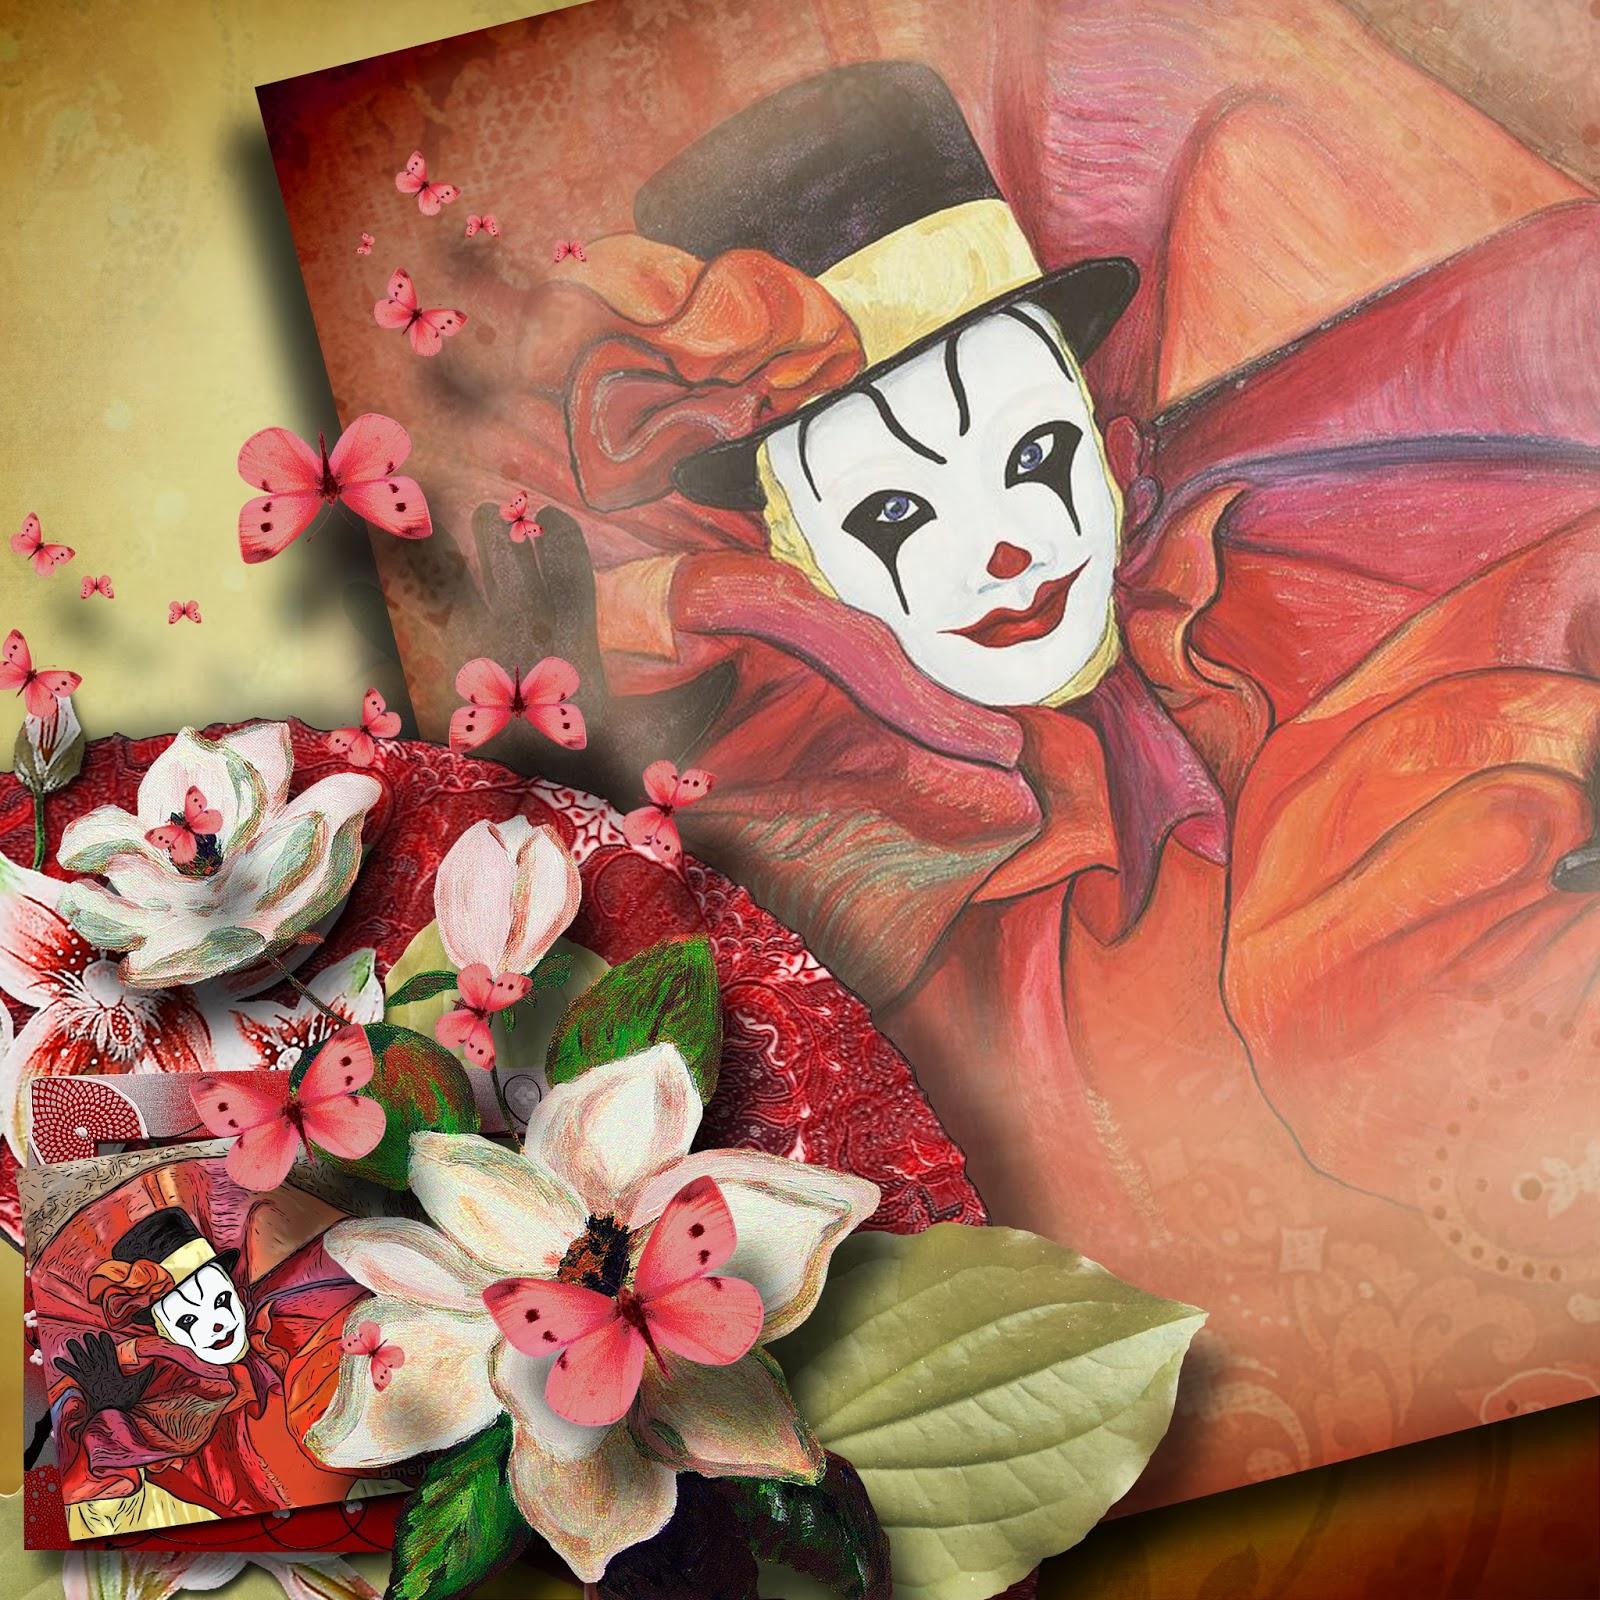 http://1.bp.blogspot.com/-dag-9tiTnAE/UxKtEwF7NiI/AAAAAAAAAUI/zdYAht1RMNc/s1600/Carnival+Clown.jpg